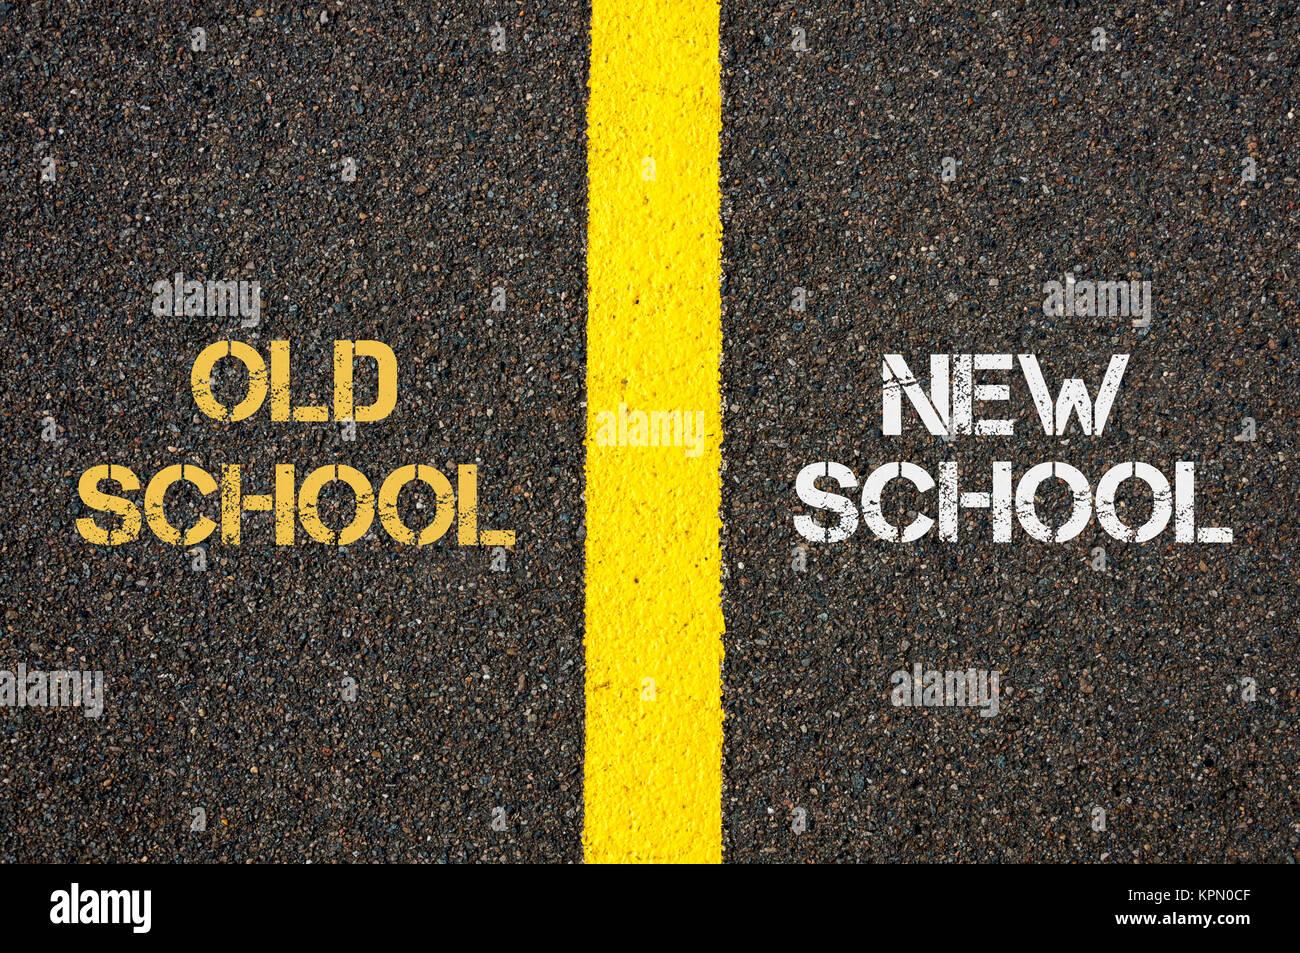 Antonym concept of OLD SCHOOL versus NEW SCHOOL Stock Photo ...